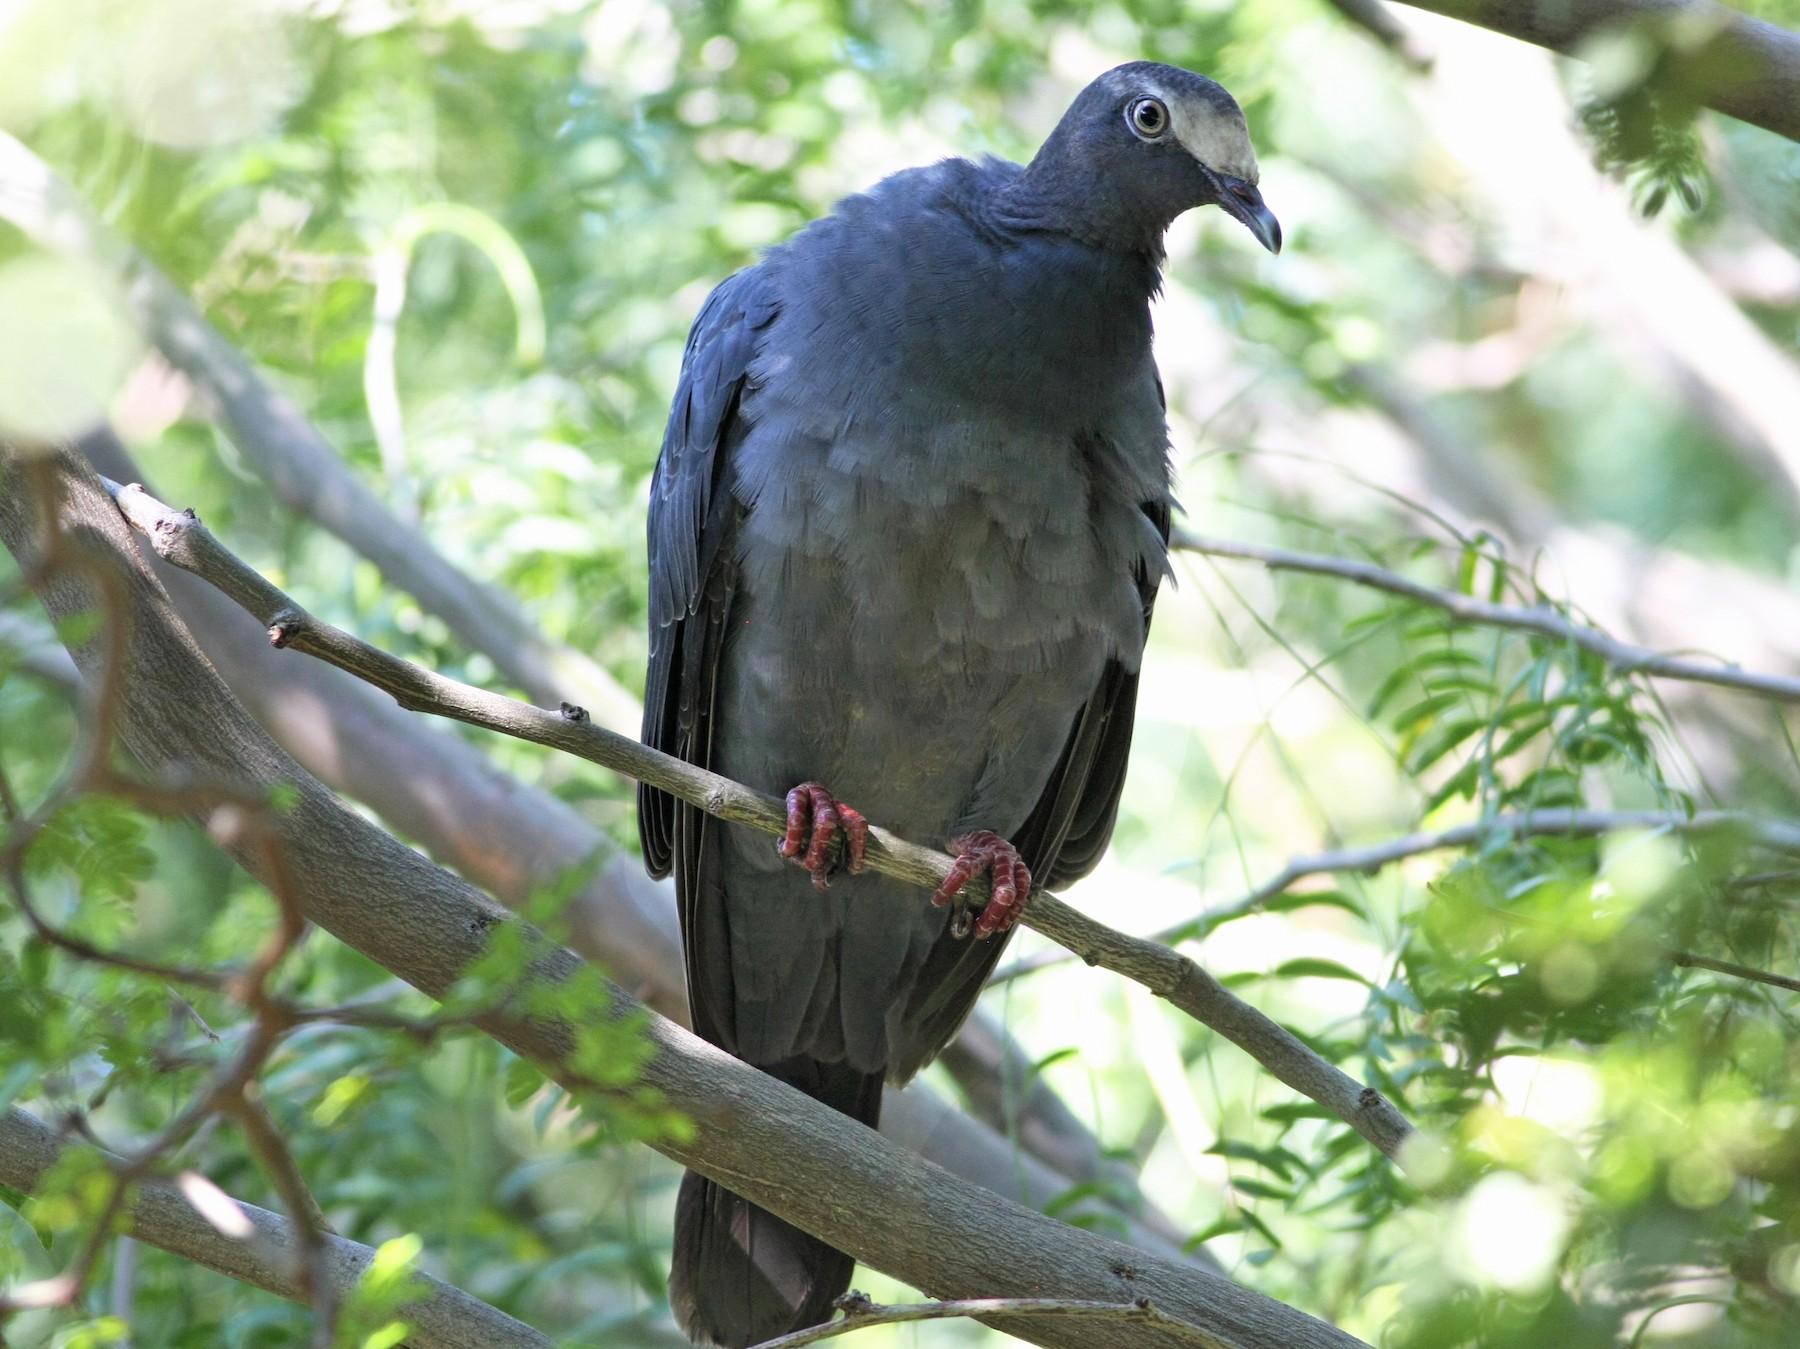 White-crowned Pigeon - Wyatt Egelhoff